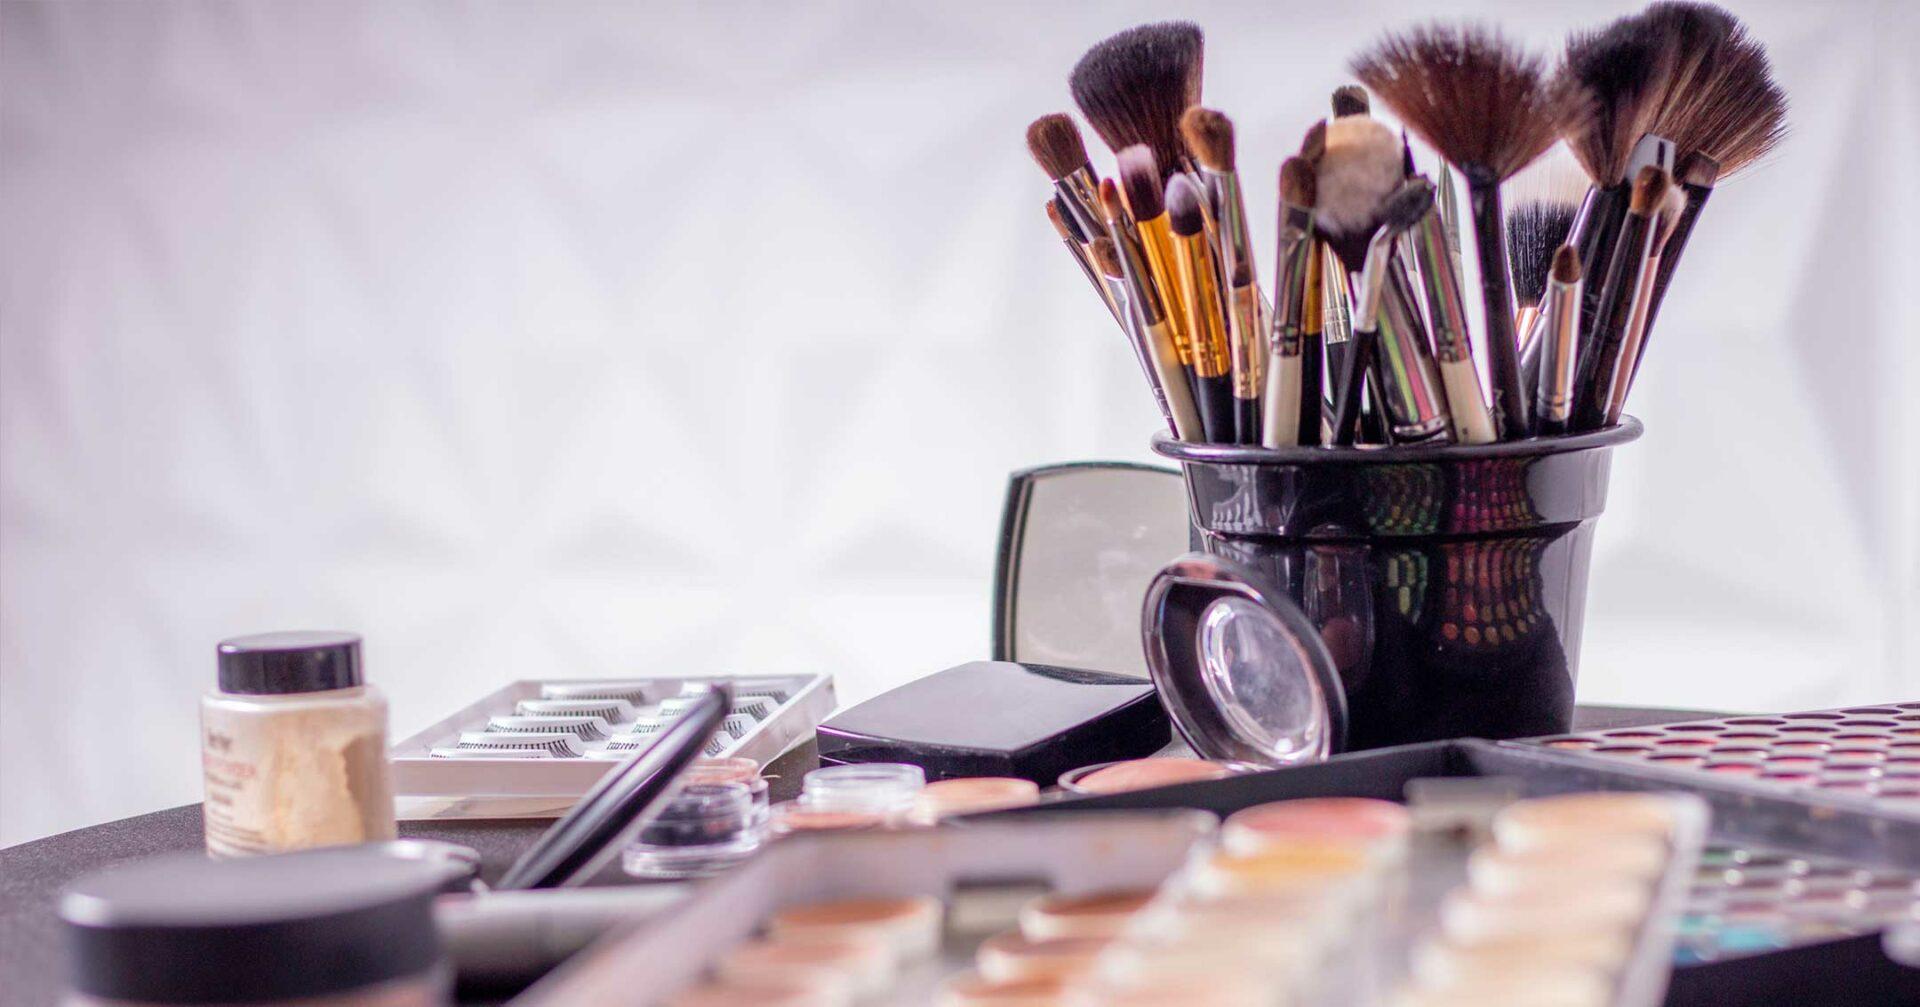 make-up and cosmetics on display